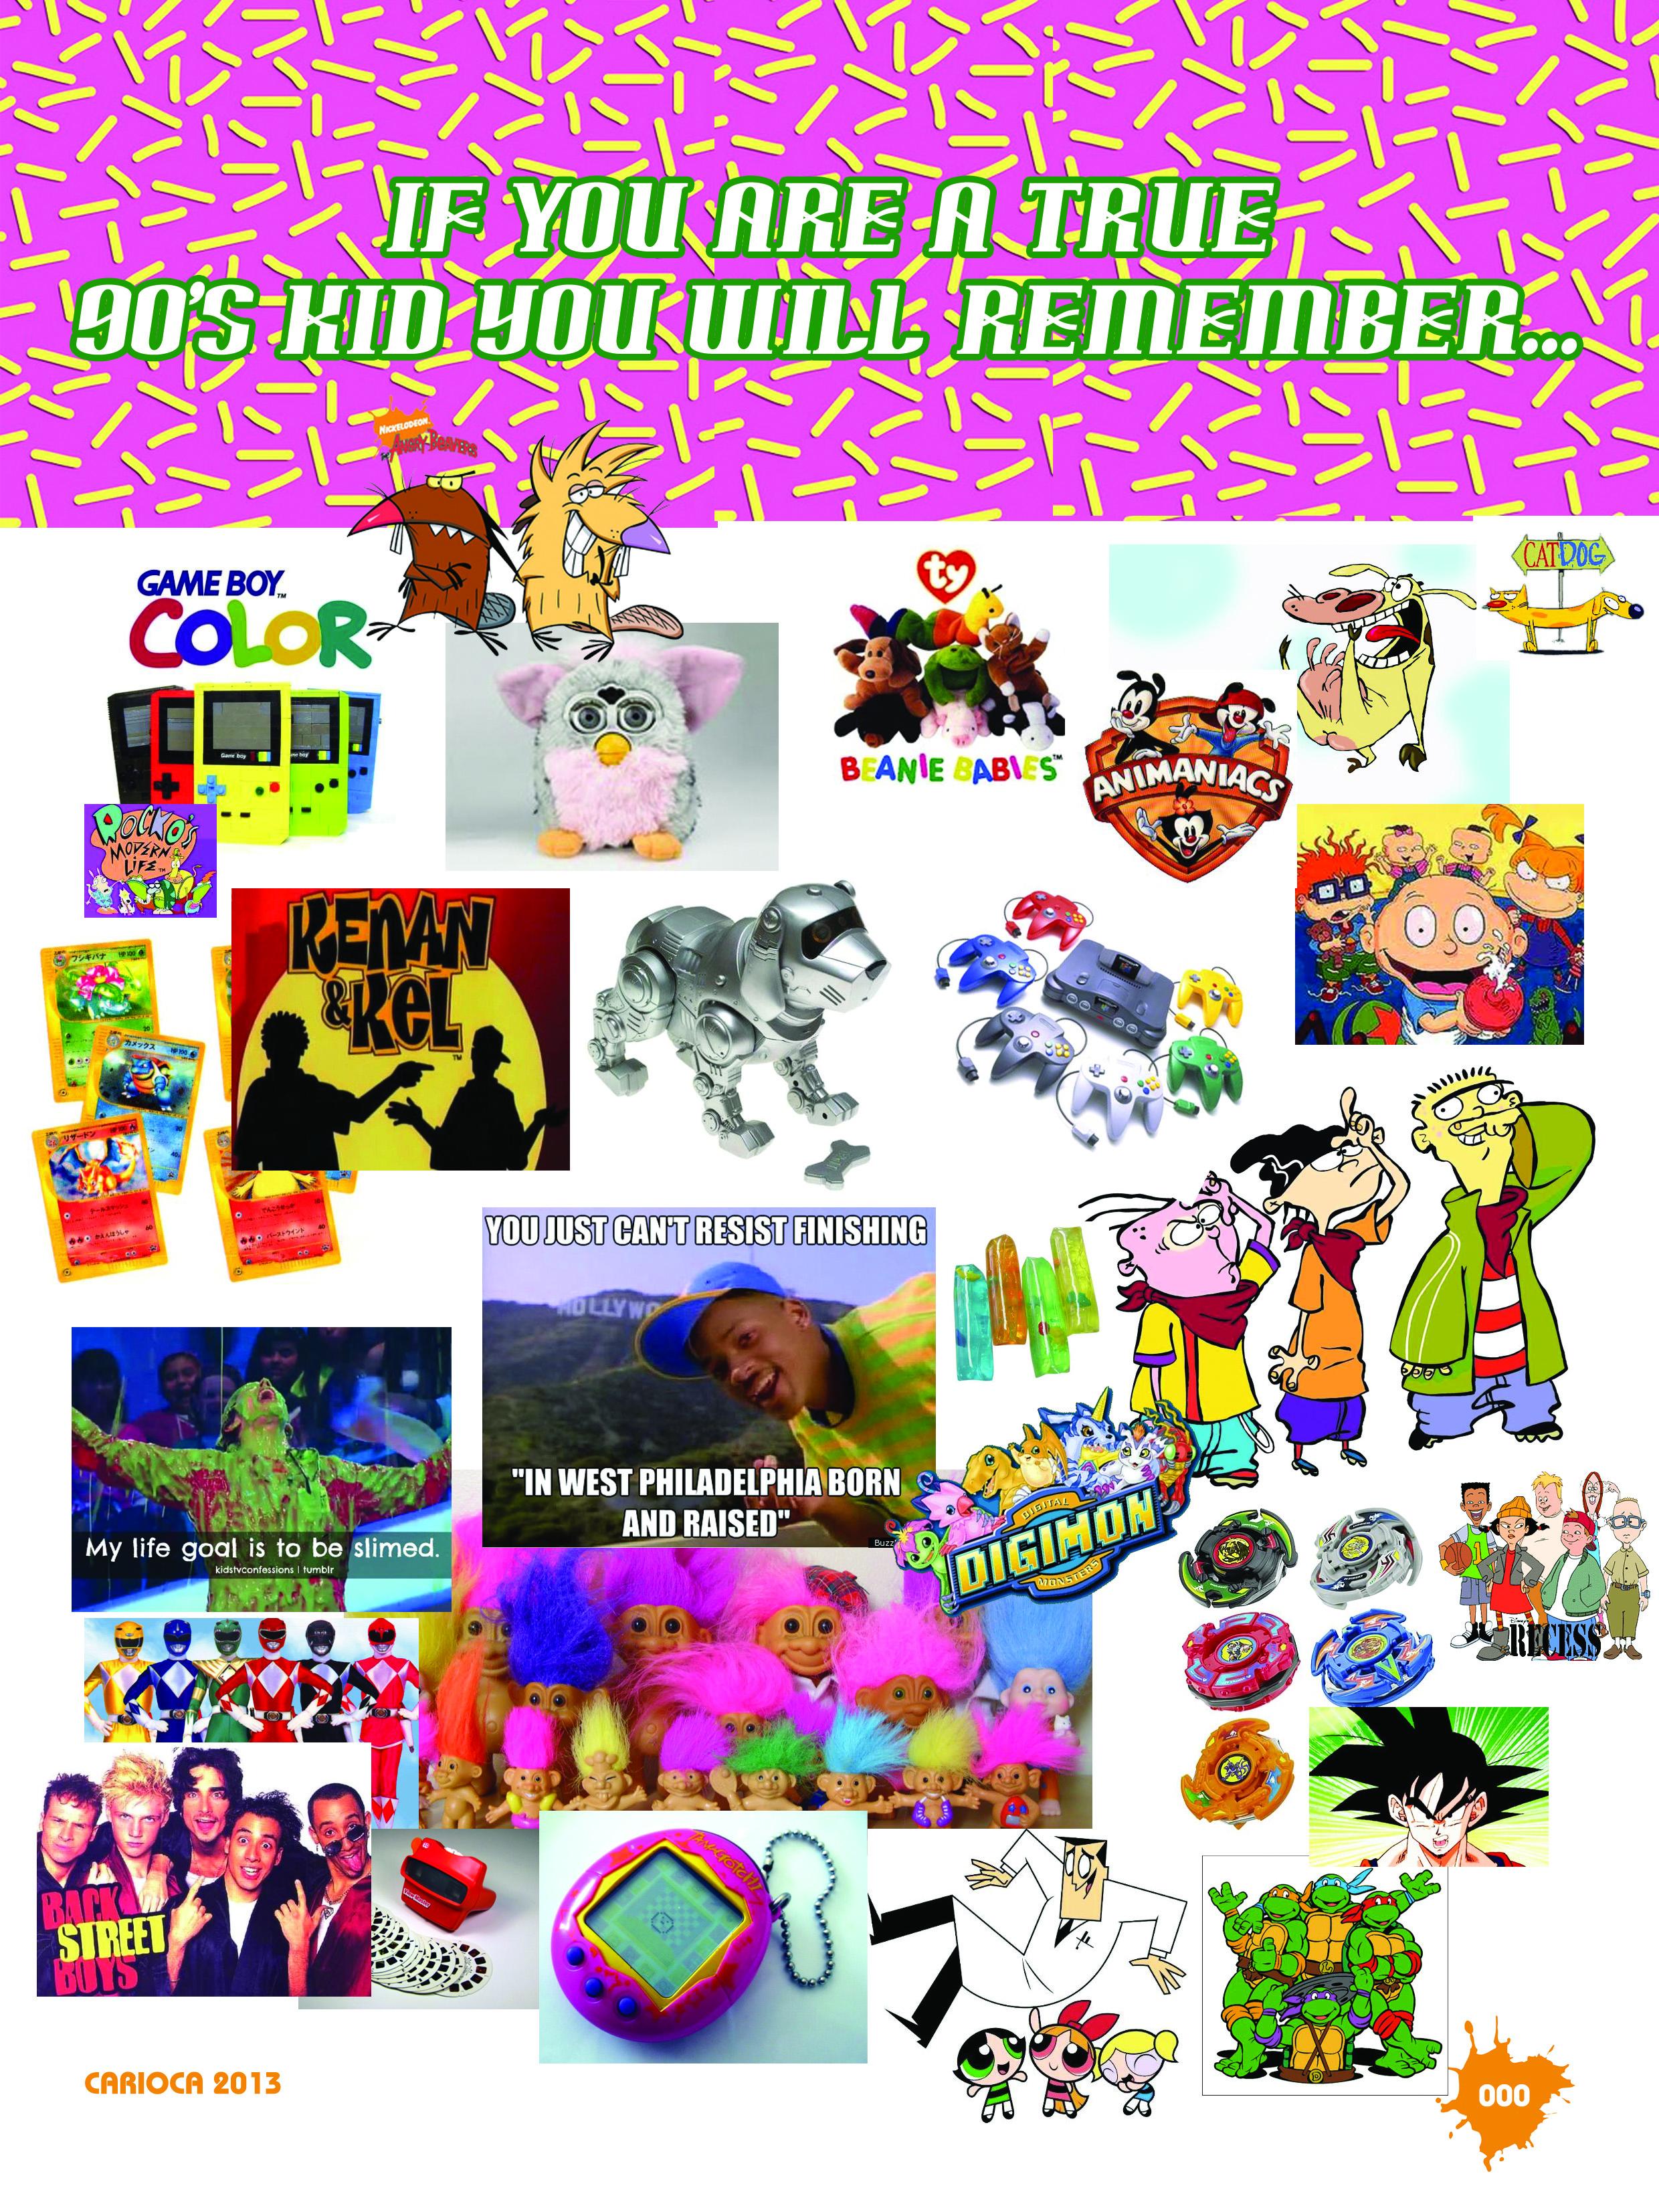 Carioca The 90s.jpg